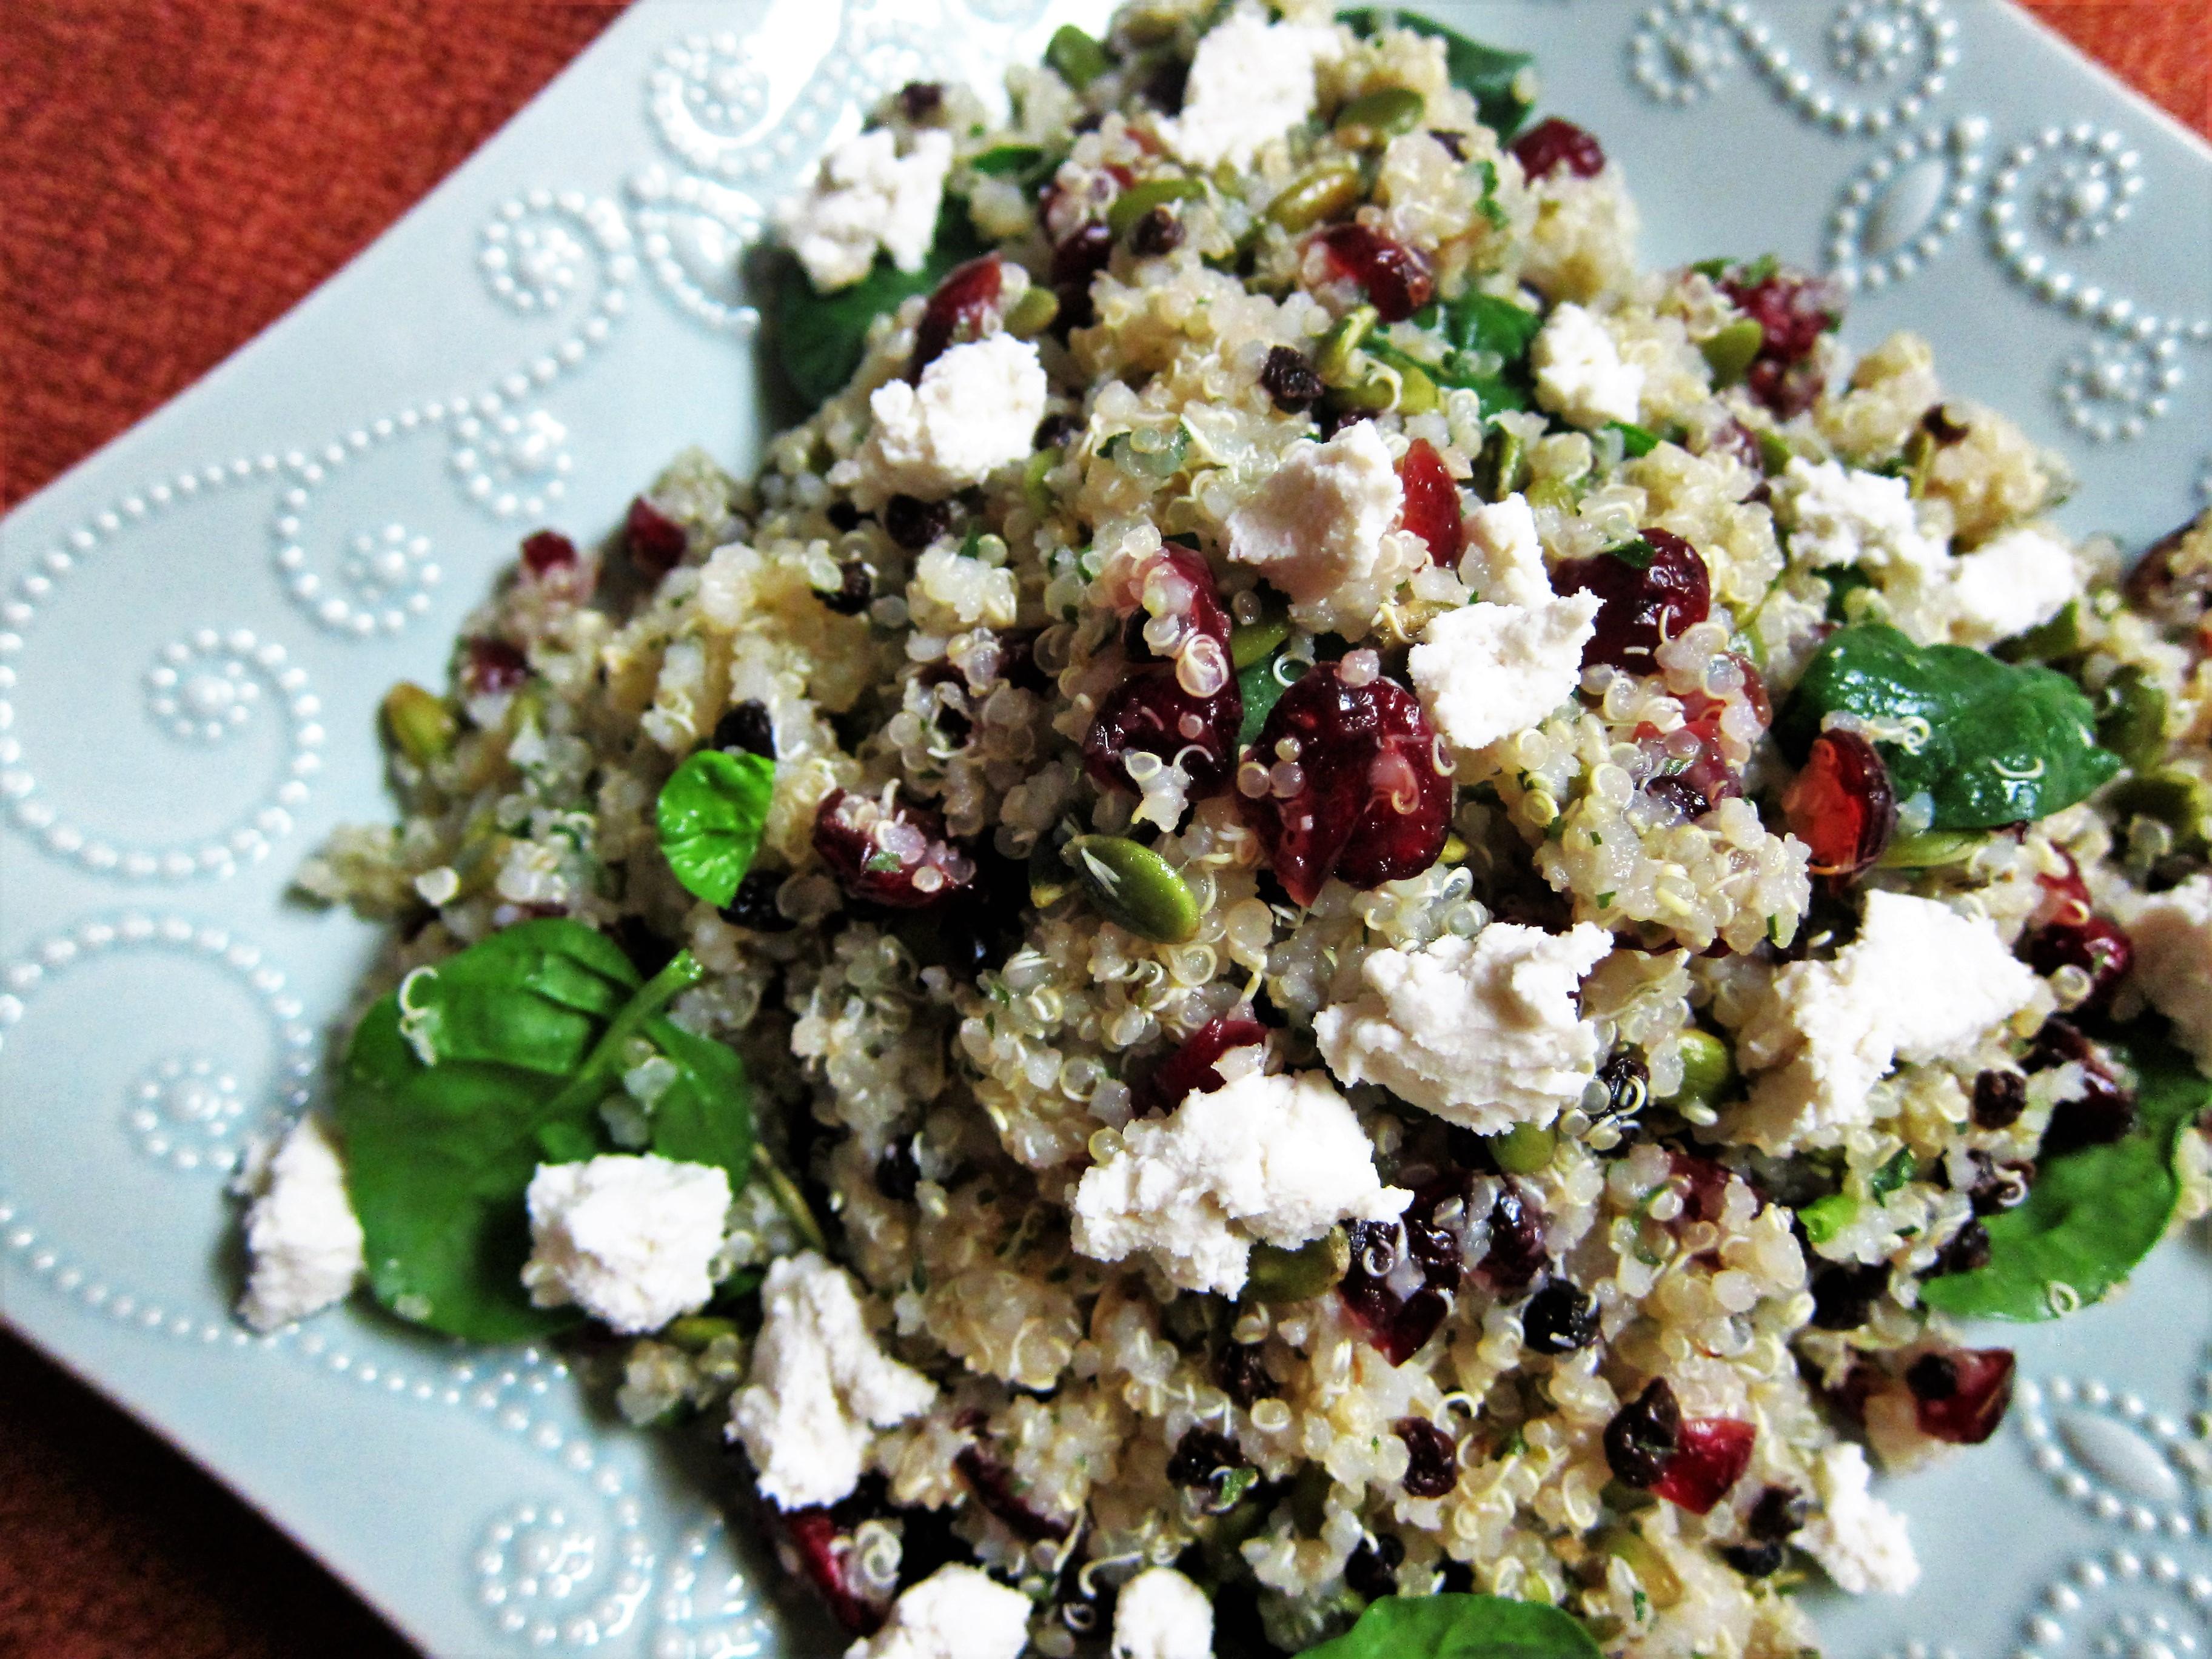 Jeweled Quinoa Salad with Macadamia Chevre